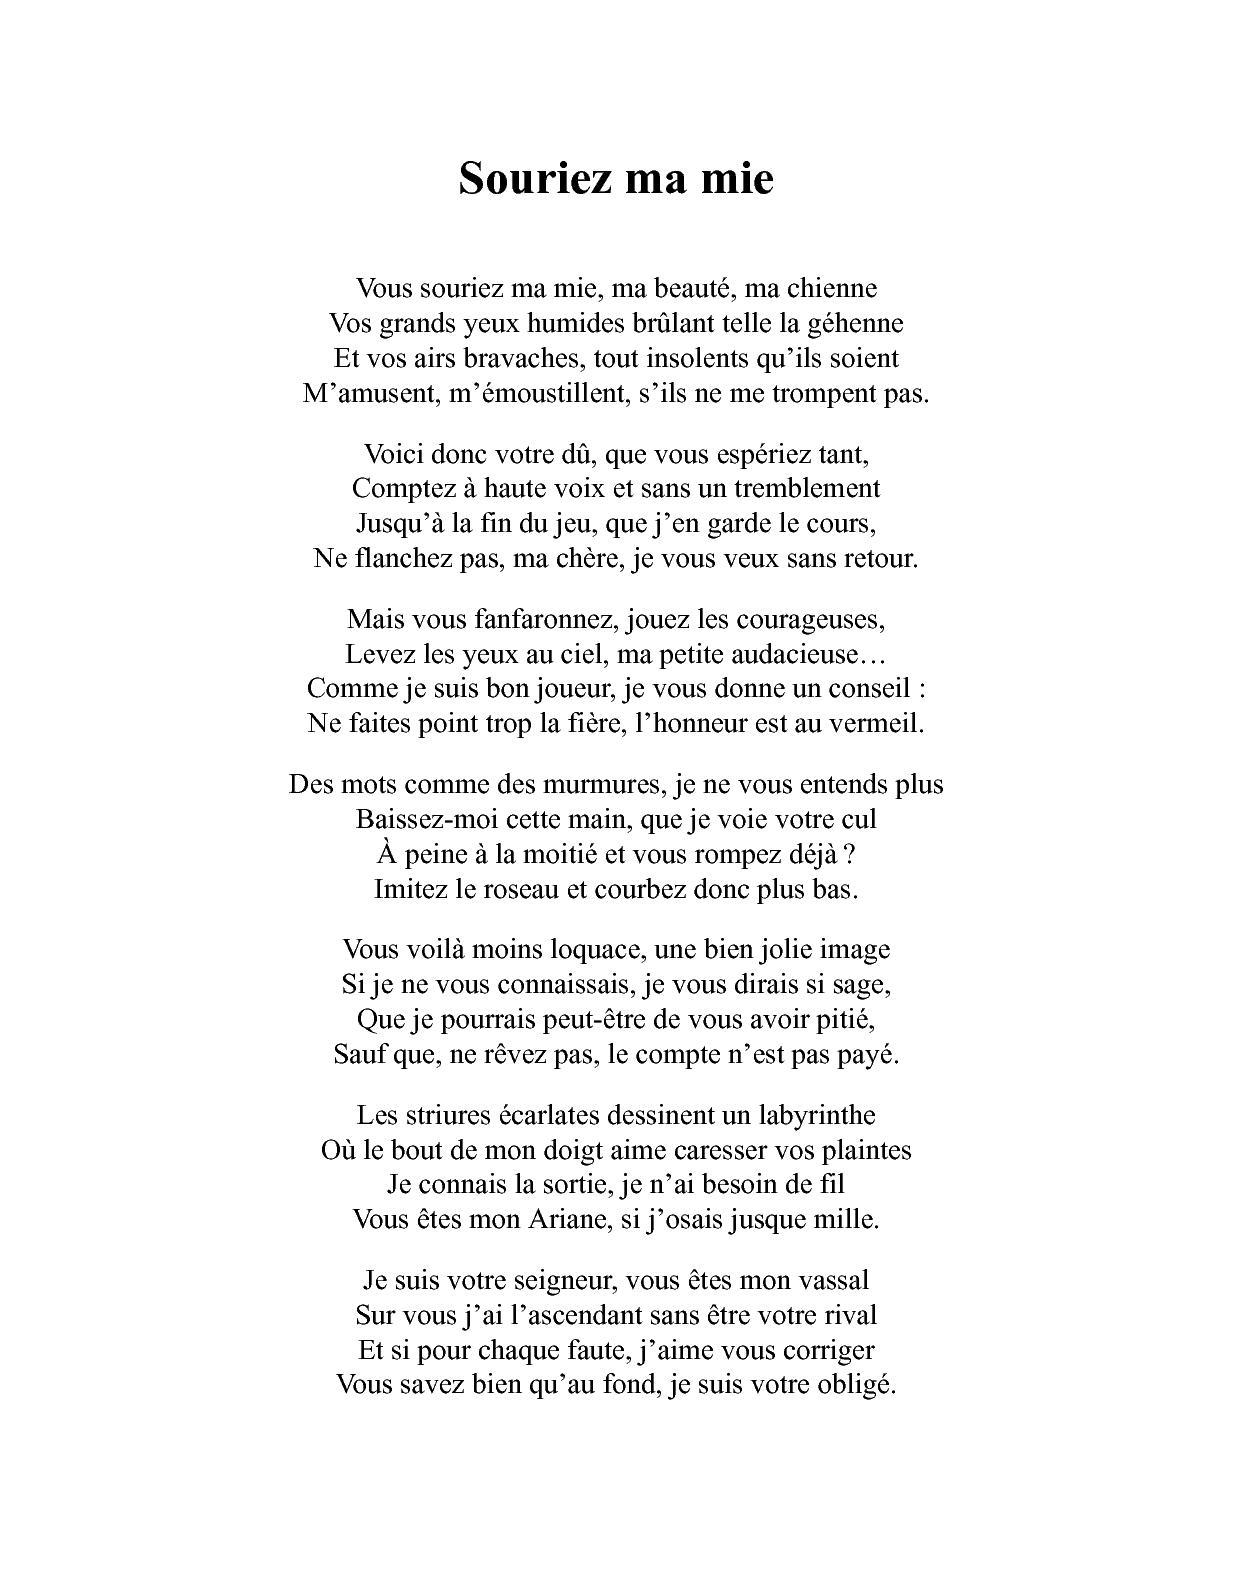 Poèmes Bdsm Collectif Dauteurs Calameo Downloader